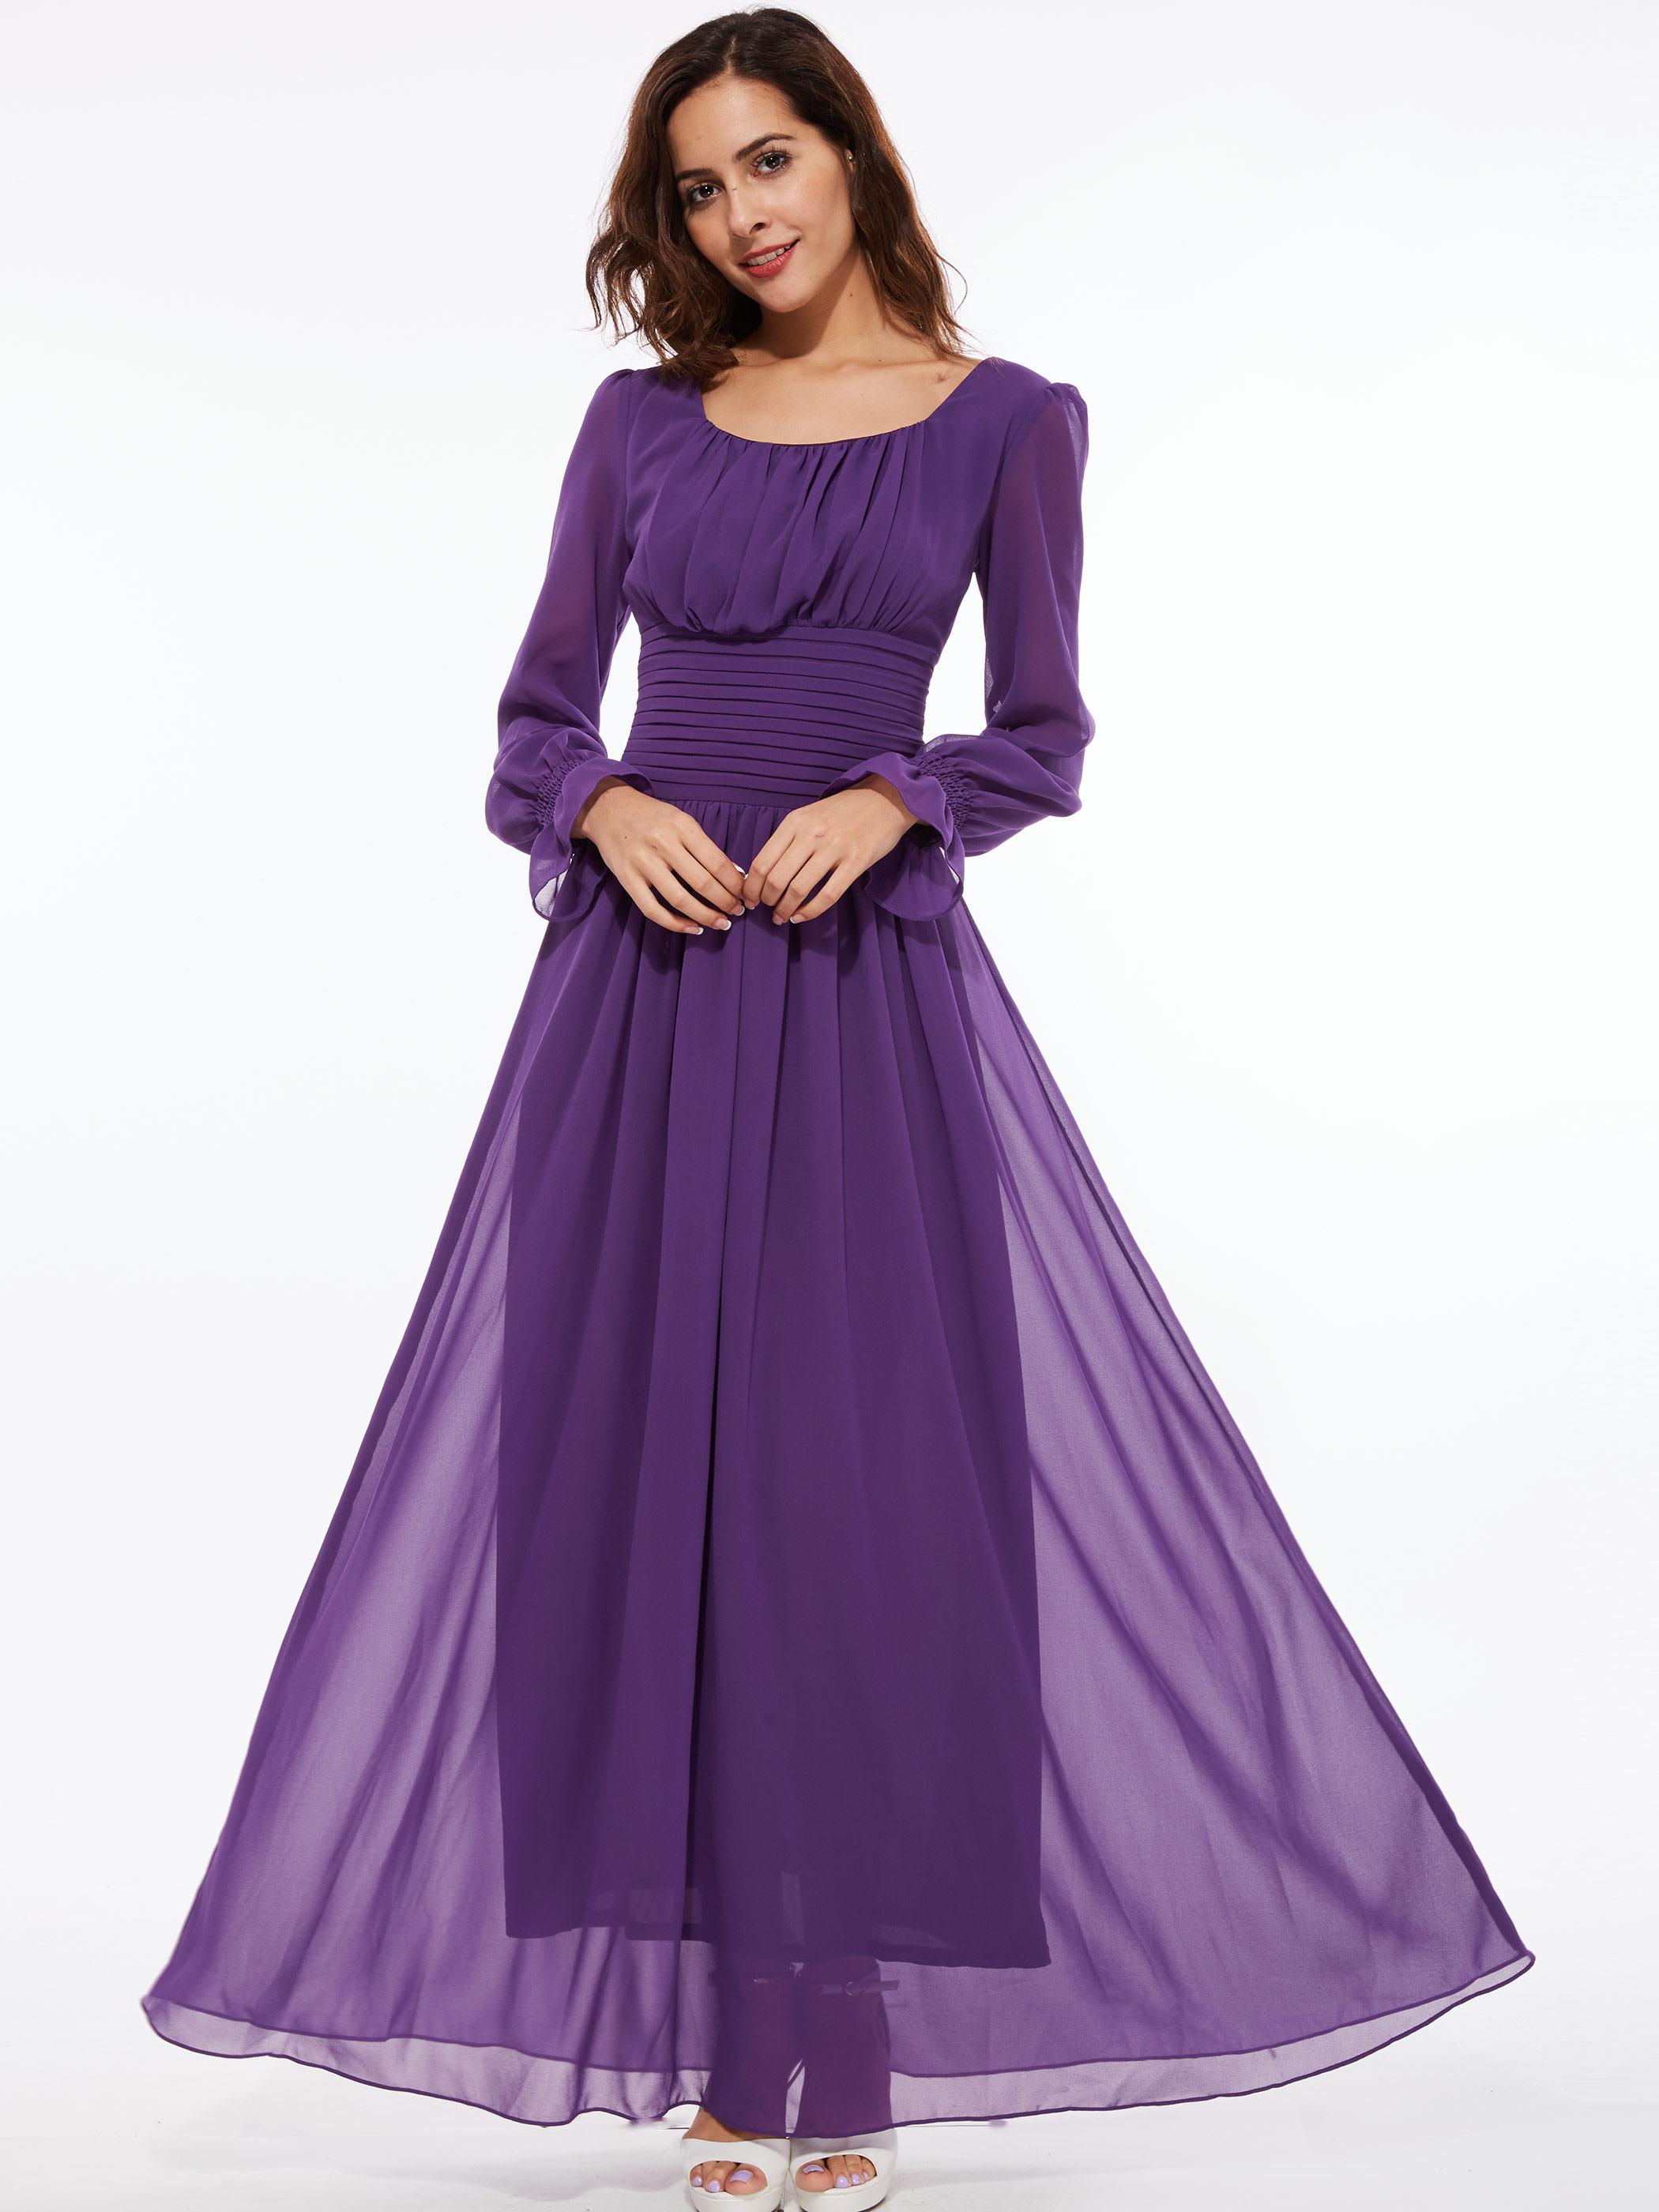 Perbandingan harga Perempuan Purple lipit Atmosphere Tunic gaun ... 44069e41fc